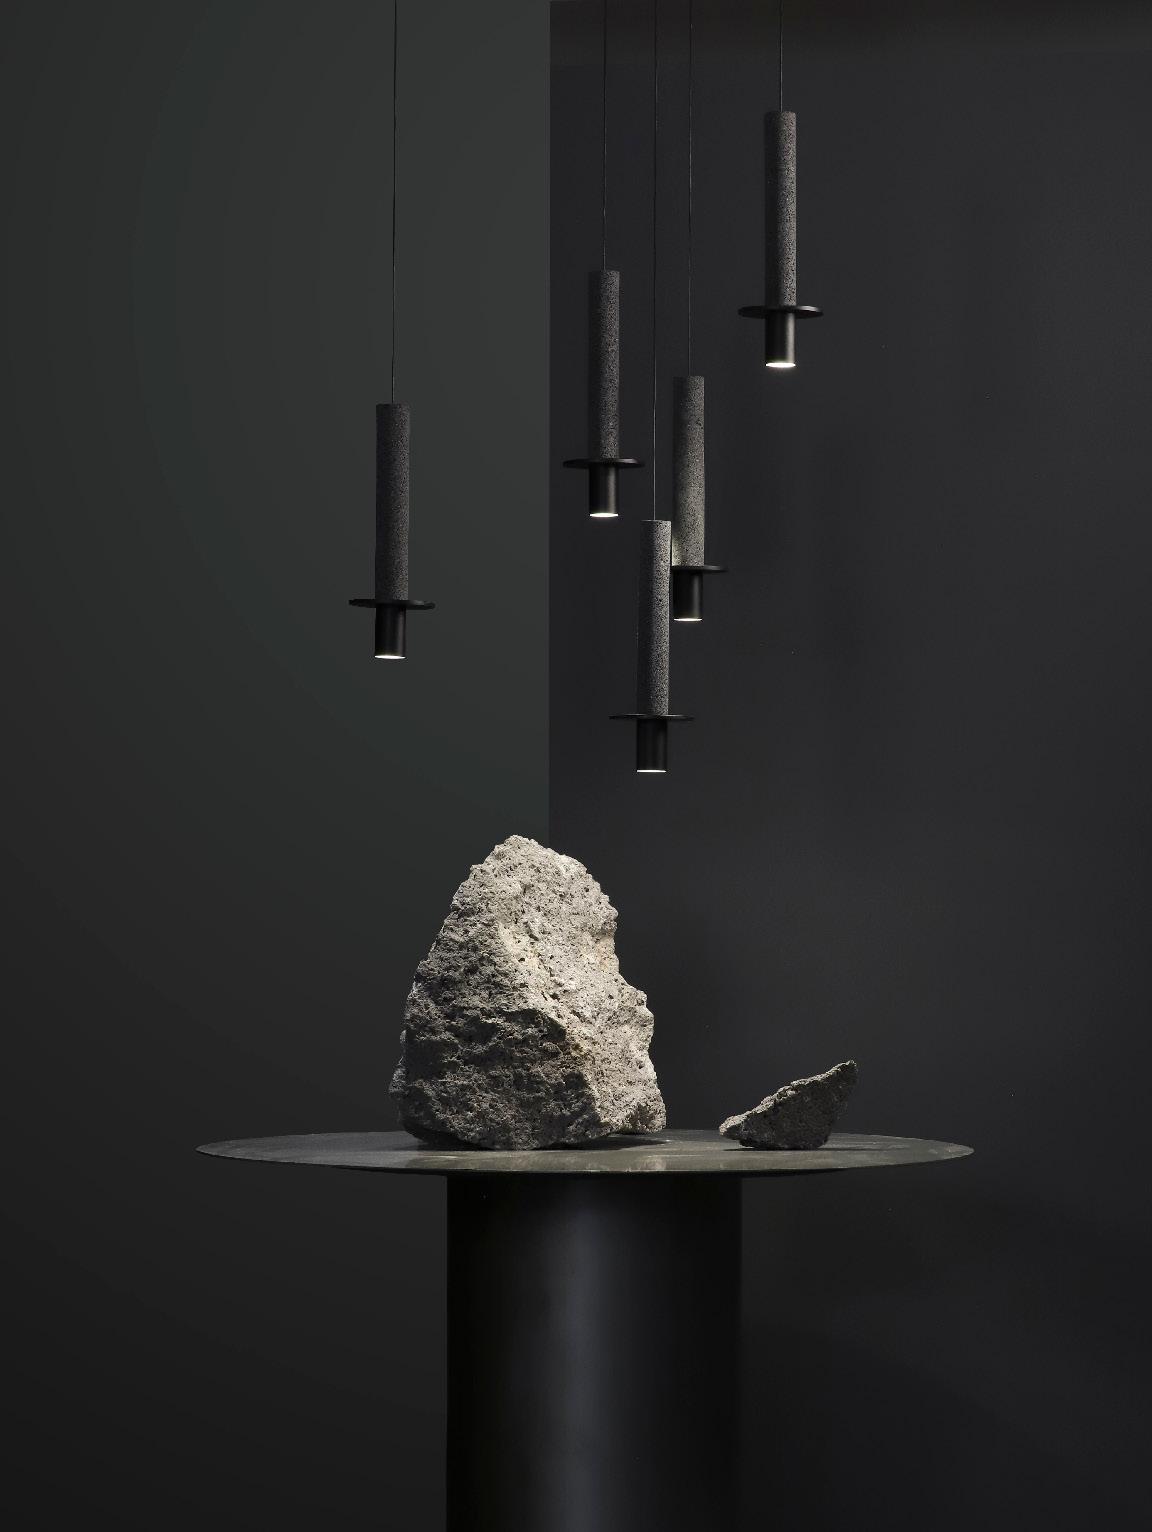 Meta David pompa, meta black composition volcanic rock